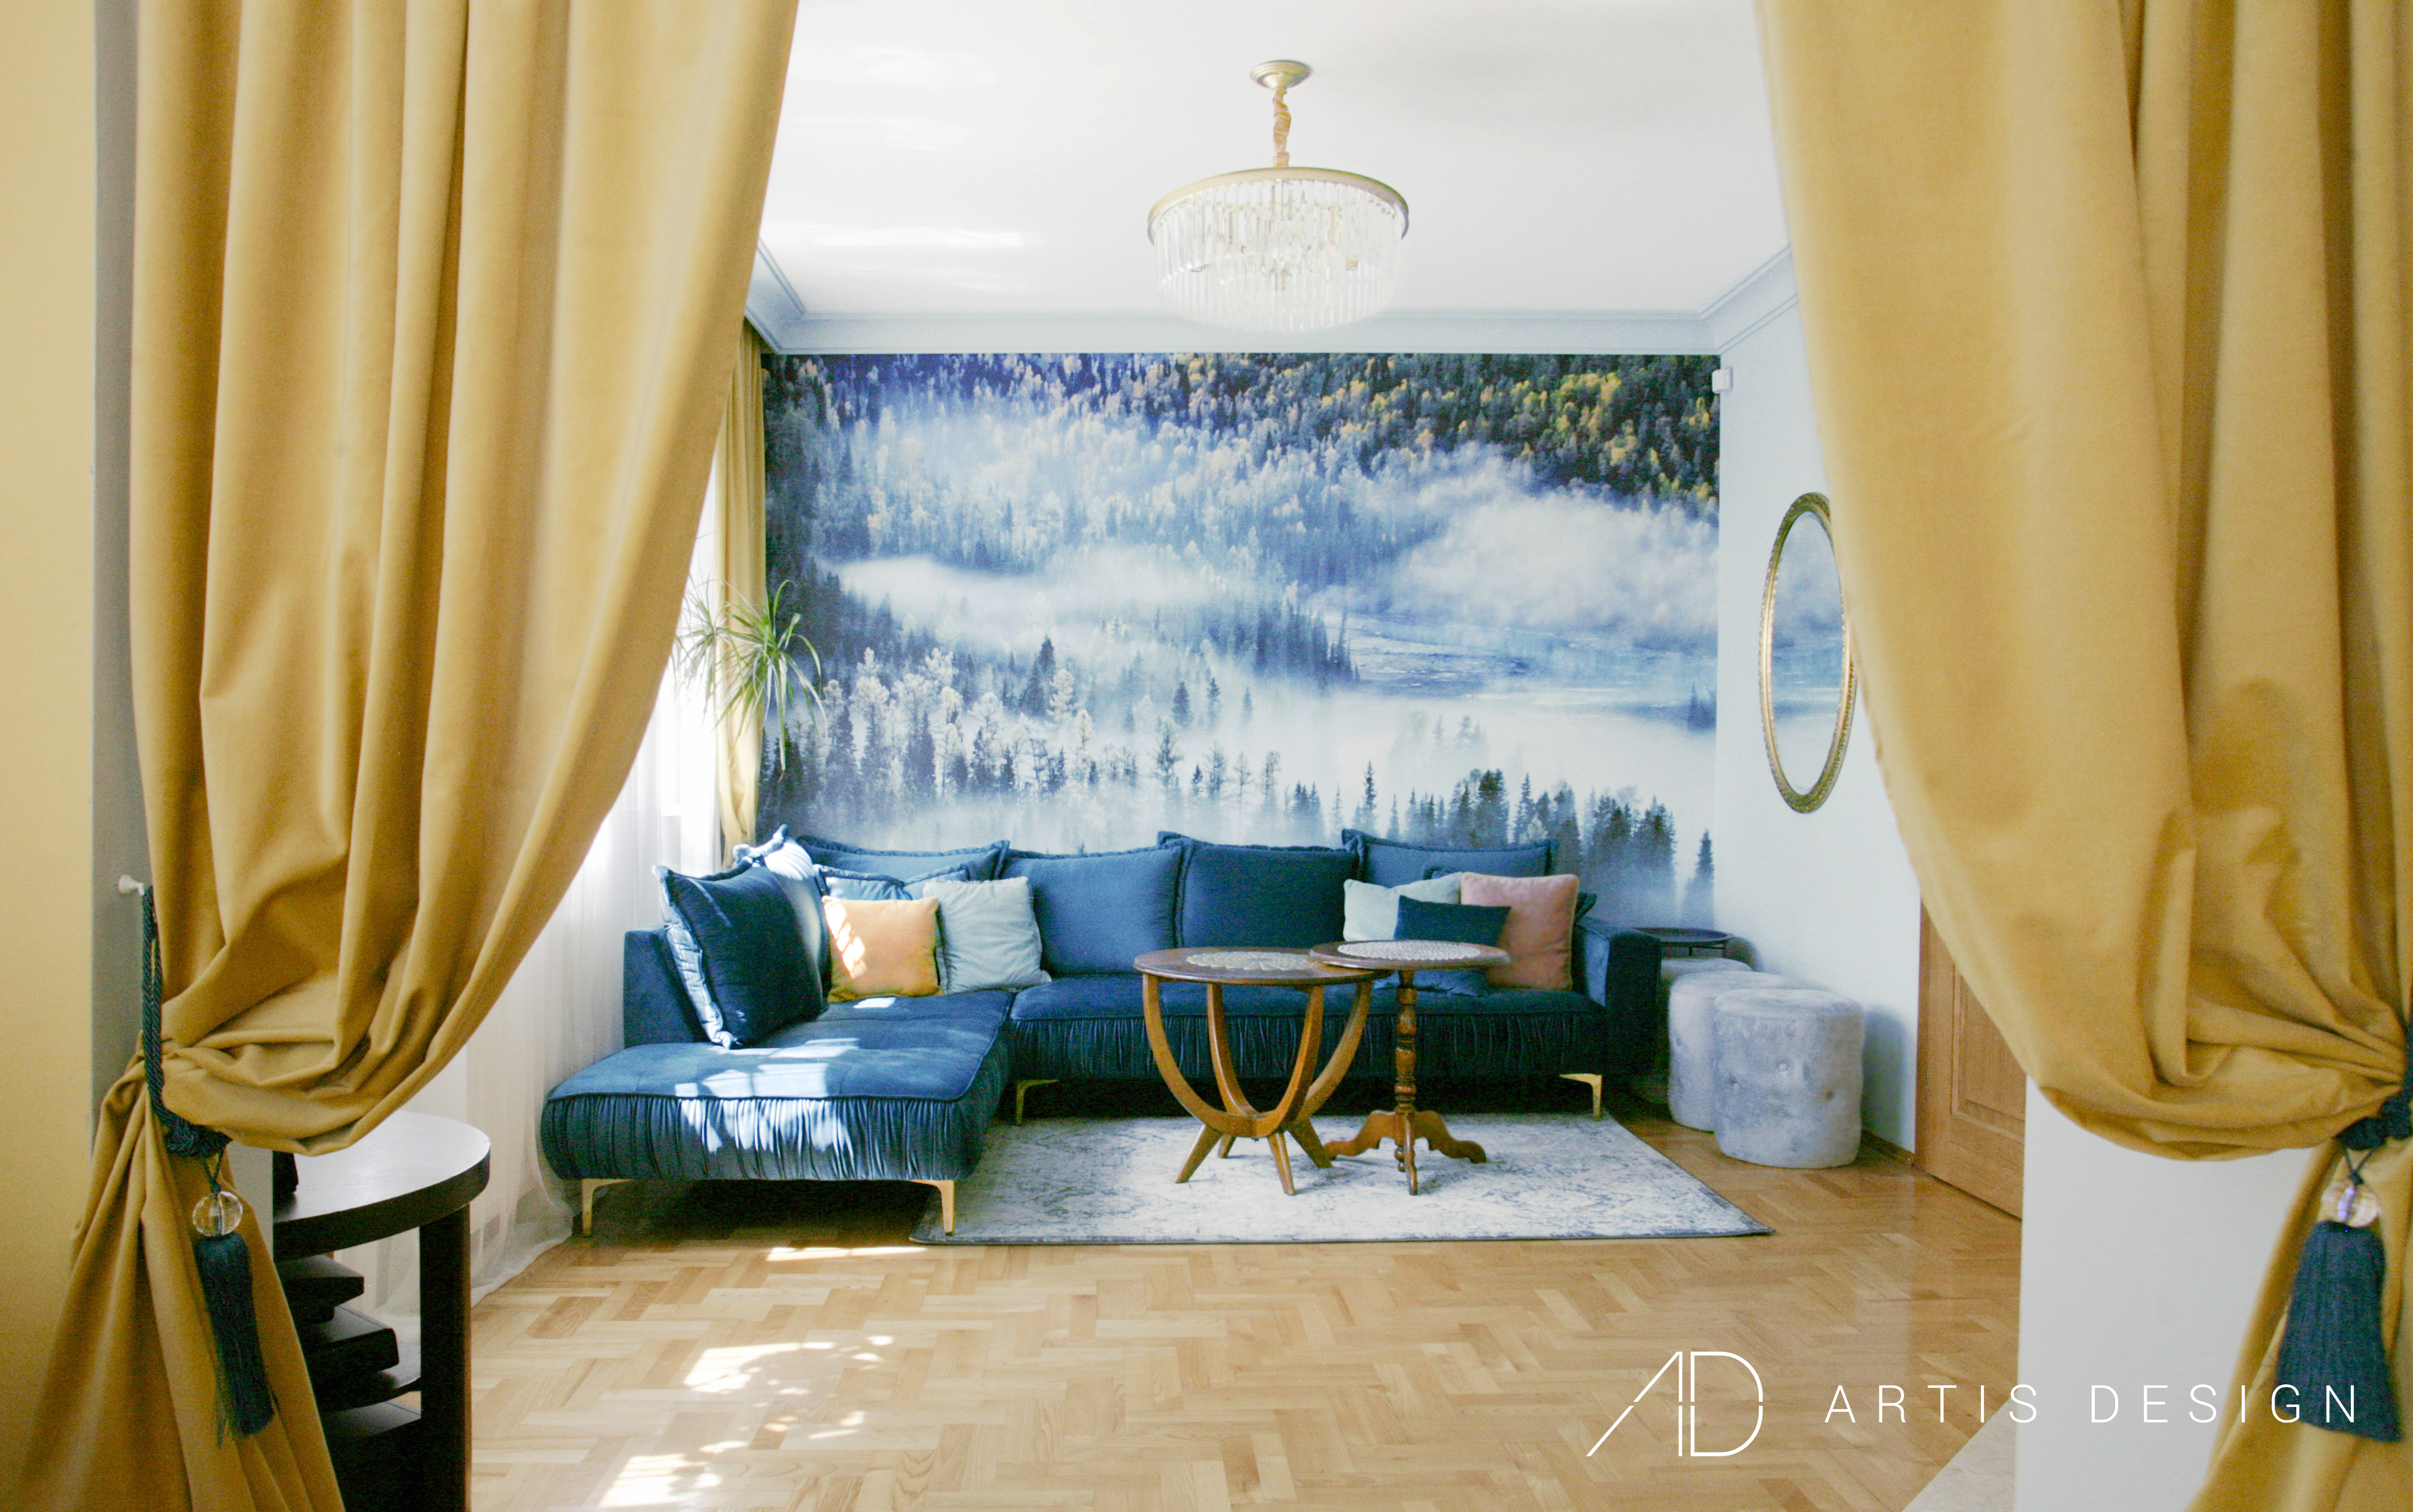 Projekt: Zaczarowana zatoka | Artis Design: Studio projektowe